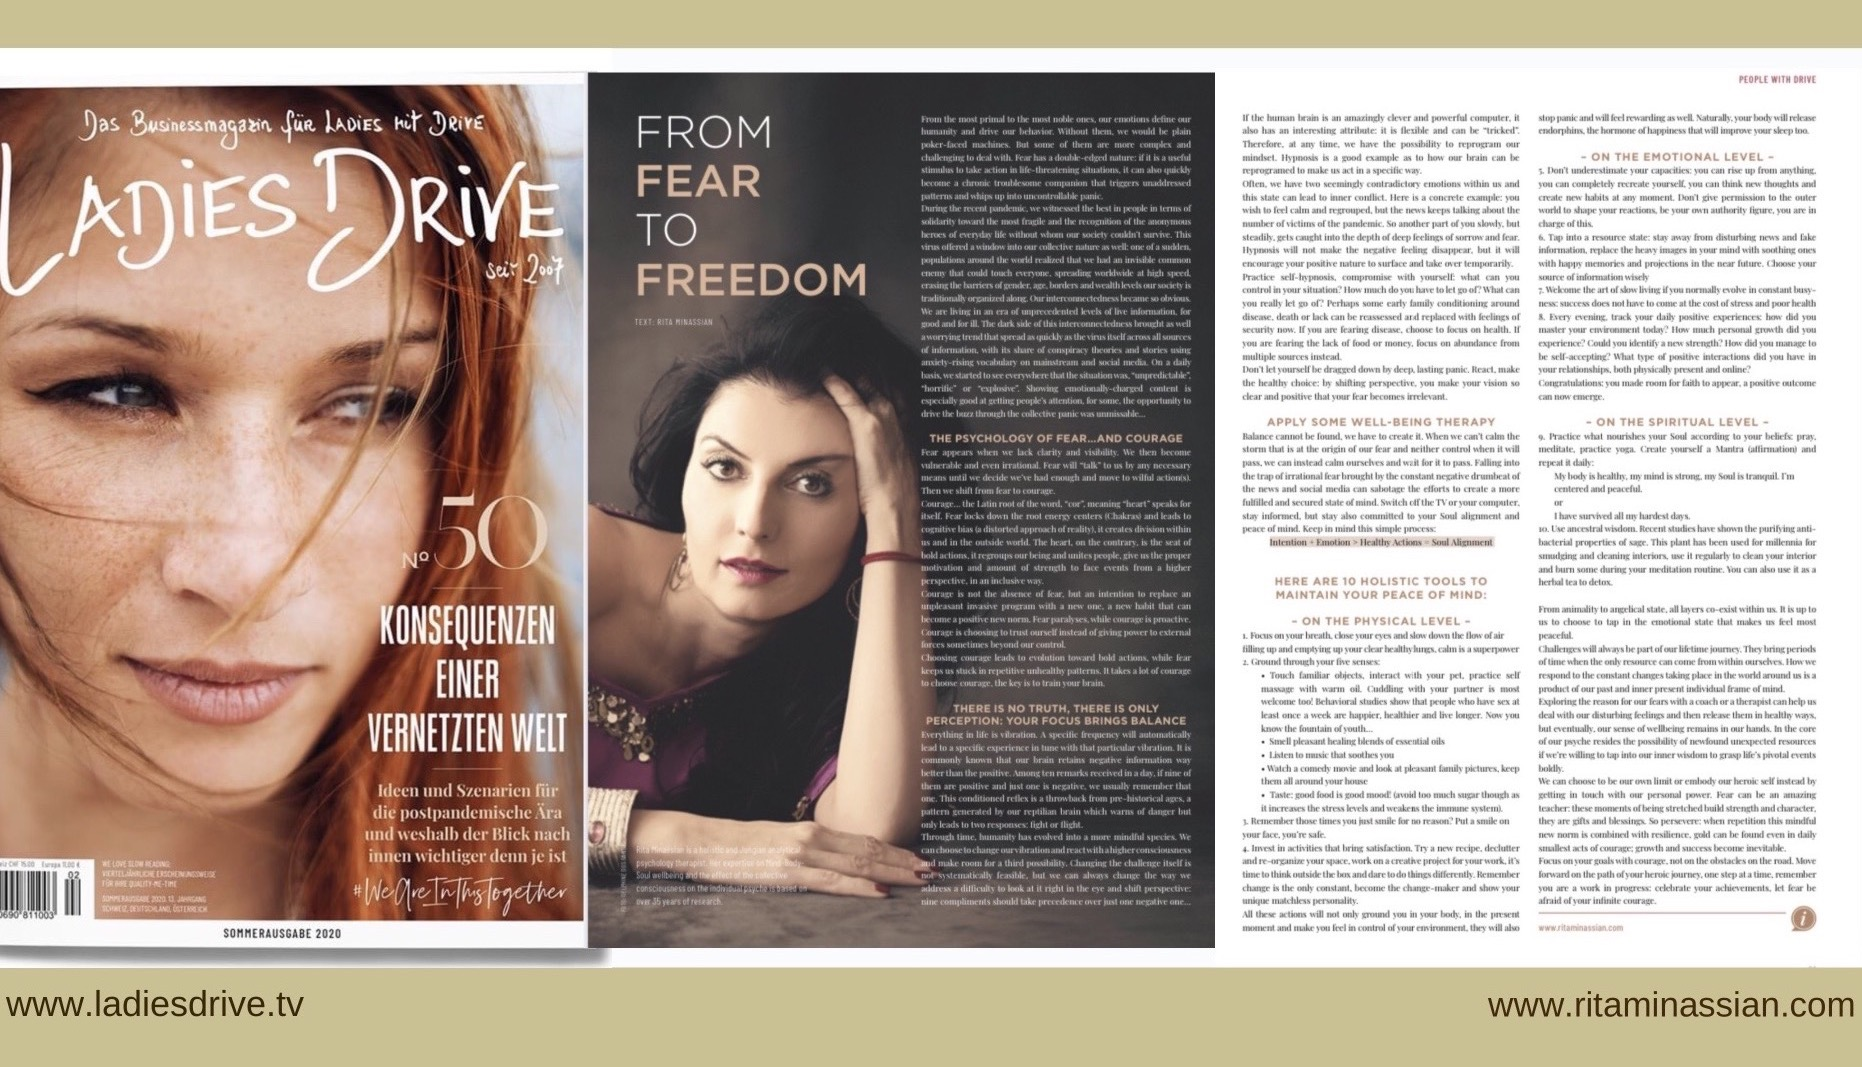 Rita Minassian Ladies drive magazine - from fear to freedom